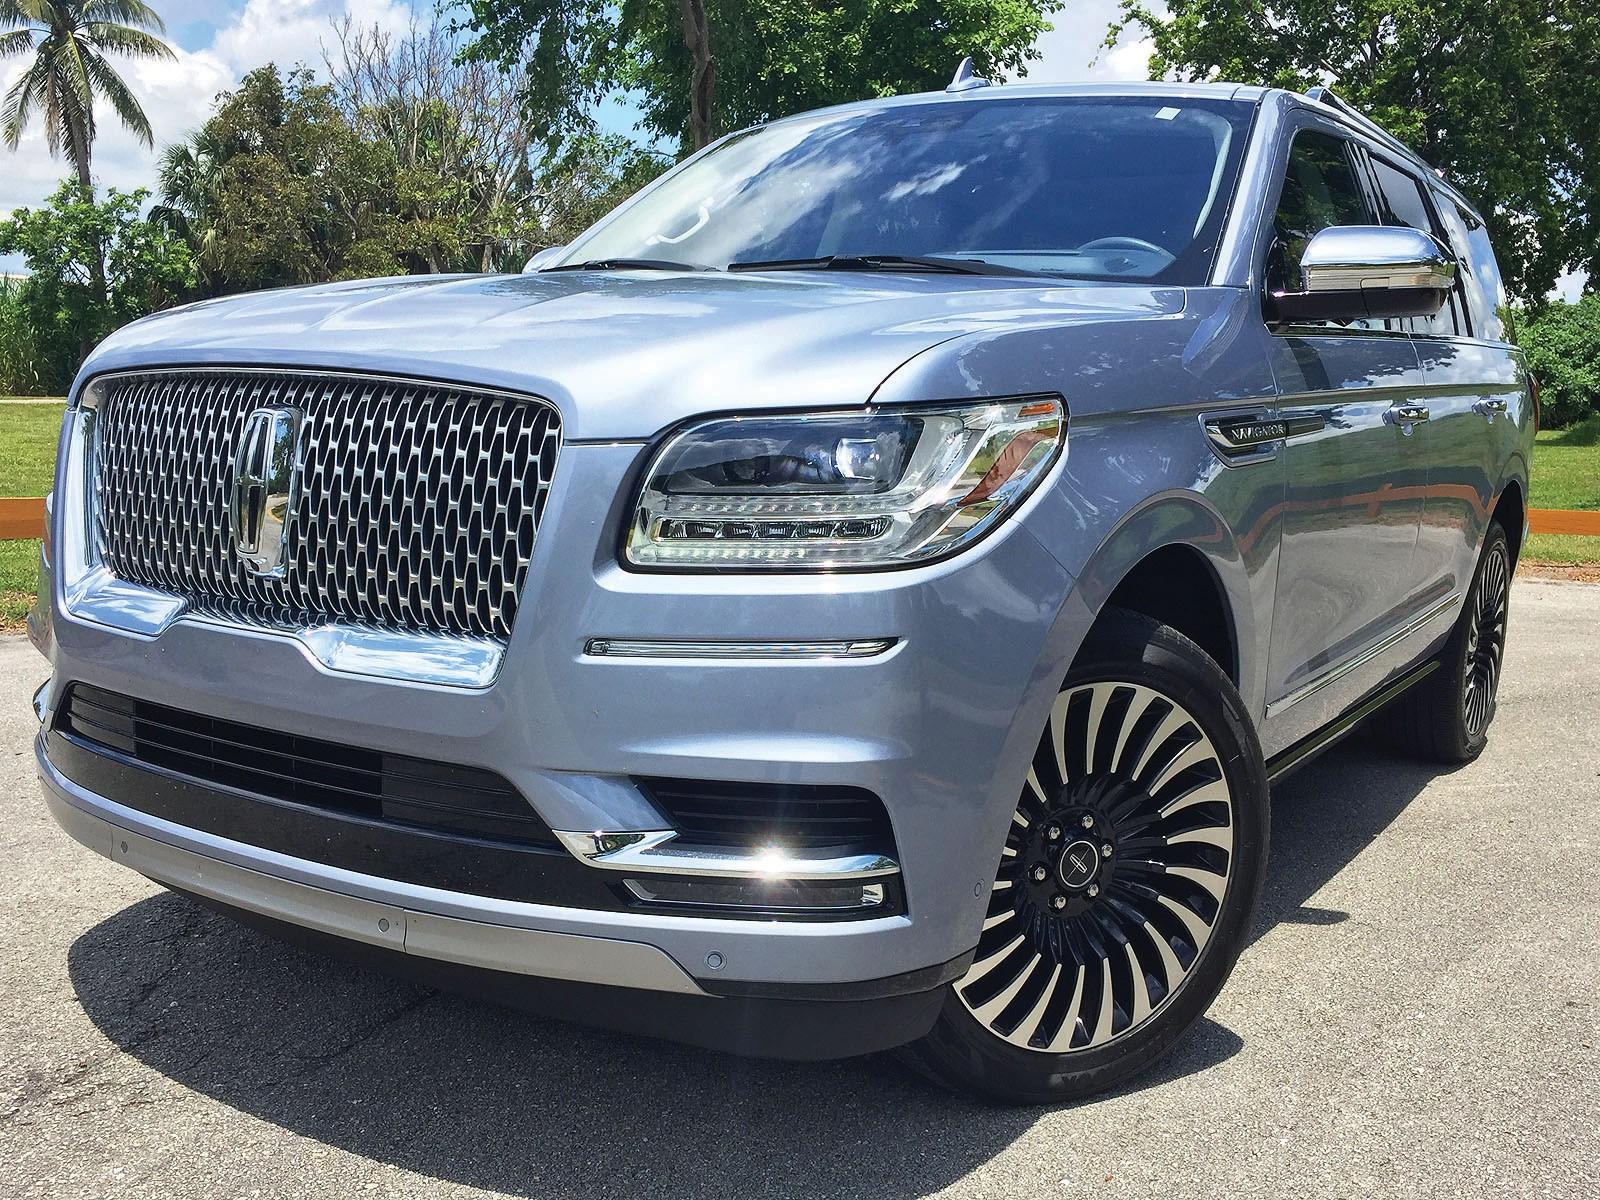 2018 Lincoln Navigator Sturdy Suv Solid Luxury Hefty Price